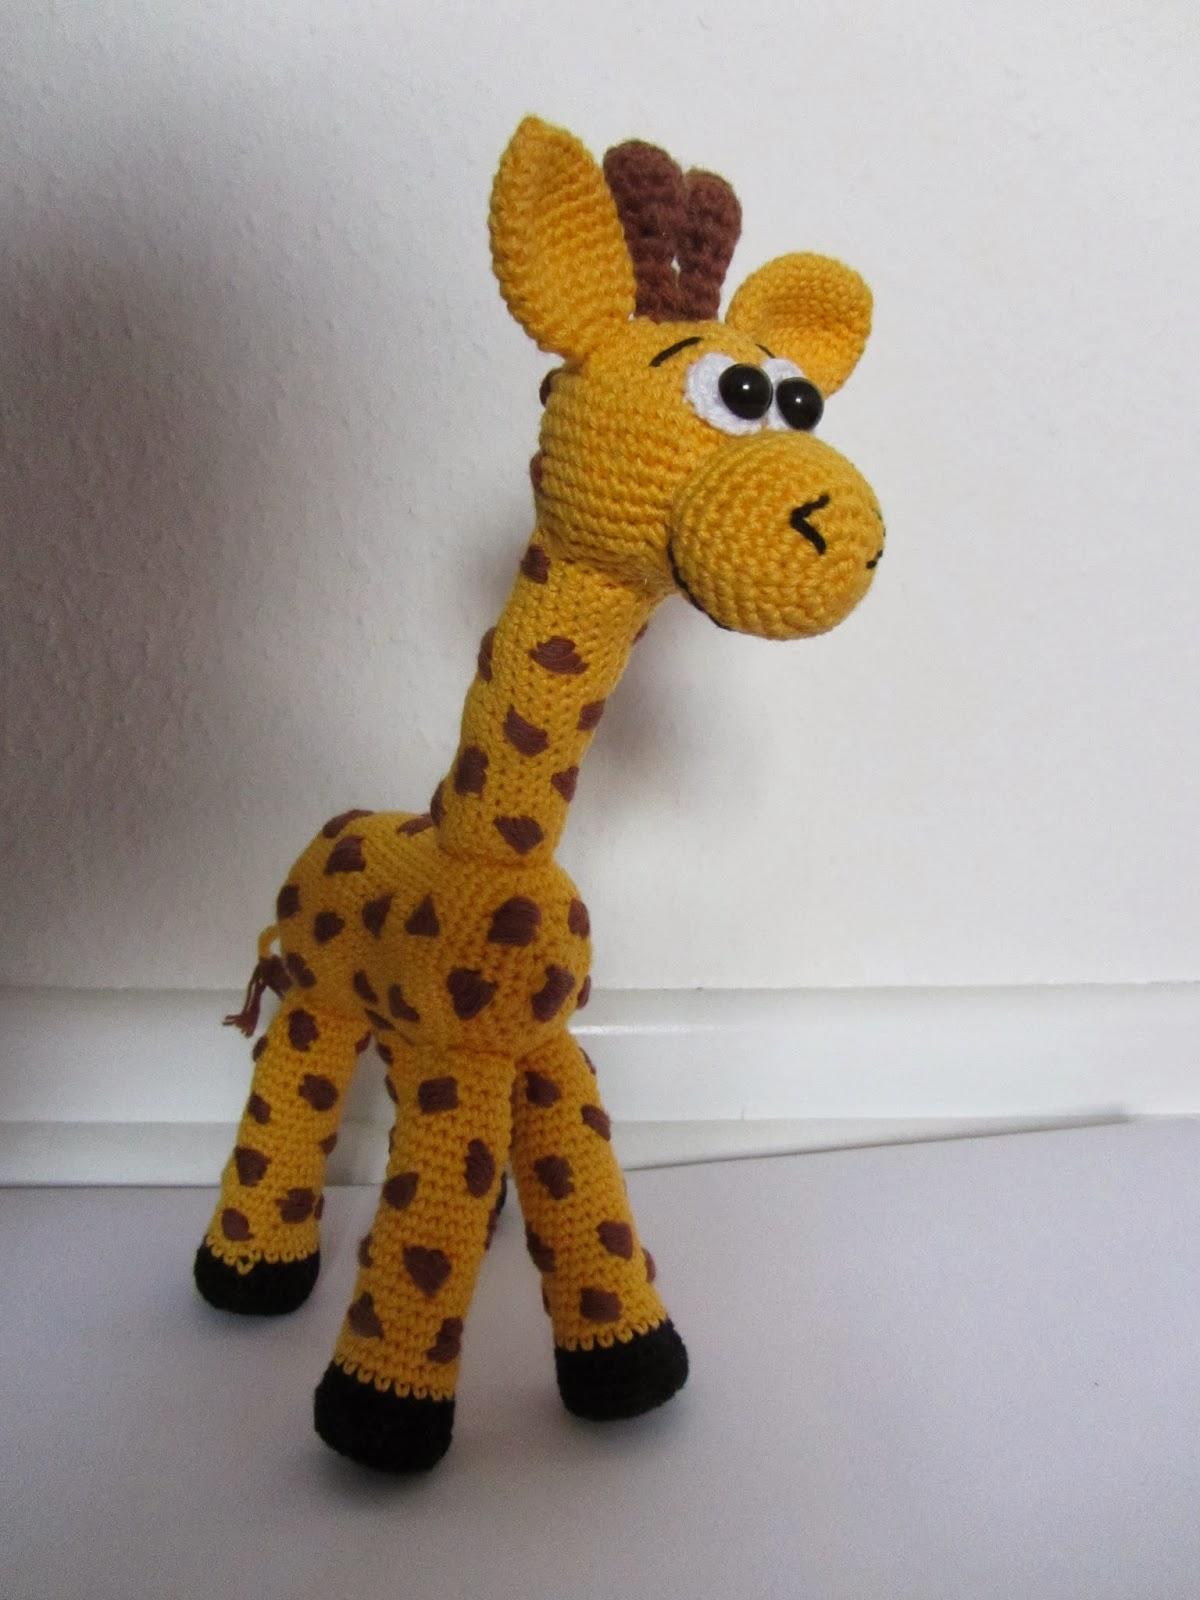 th-INK-colourful: Giraffe gehäkelt